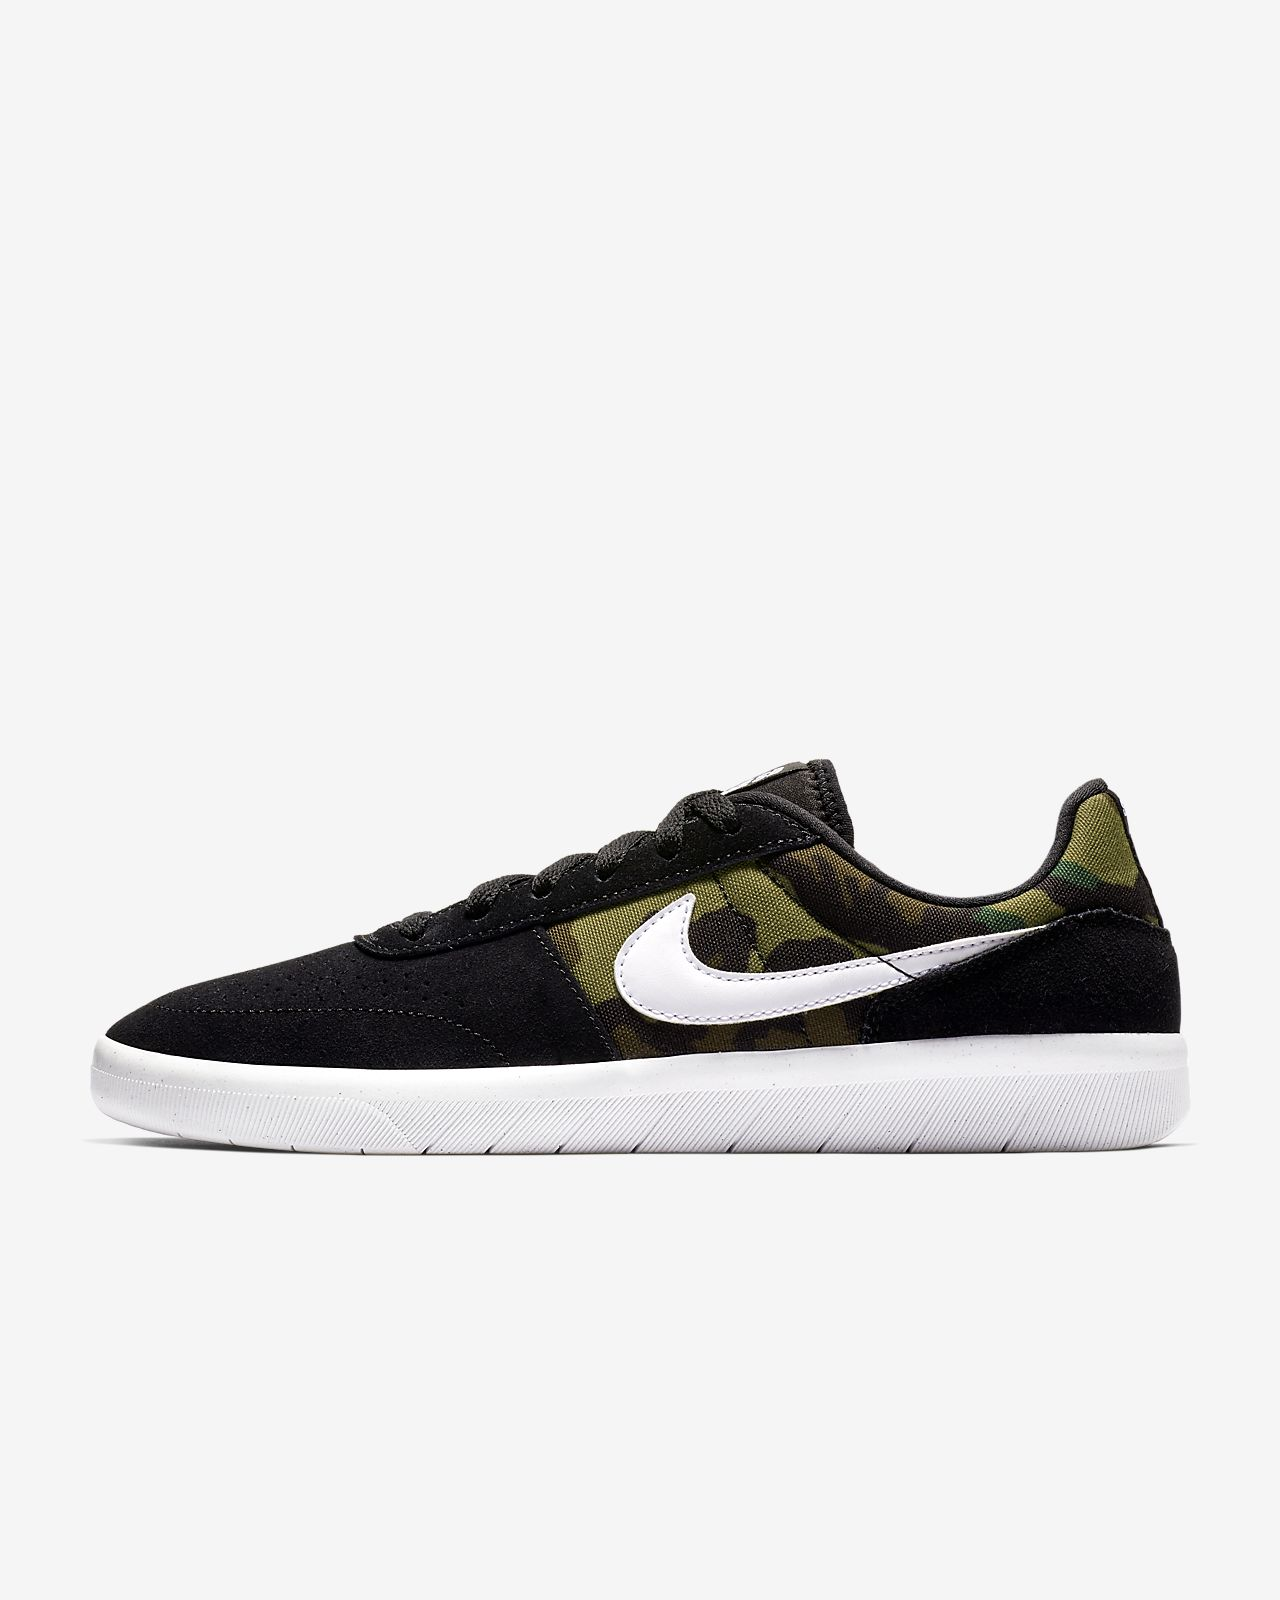 huge discount 5dd61 7f009 ... Scarpa da skate Nike SB Team Classic - Uomo